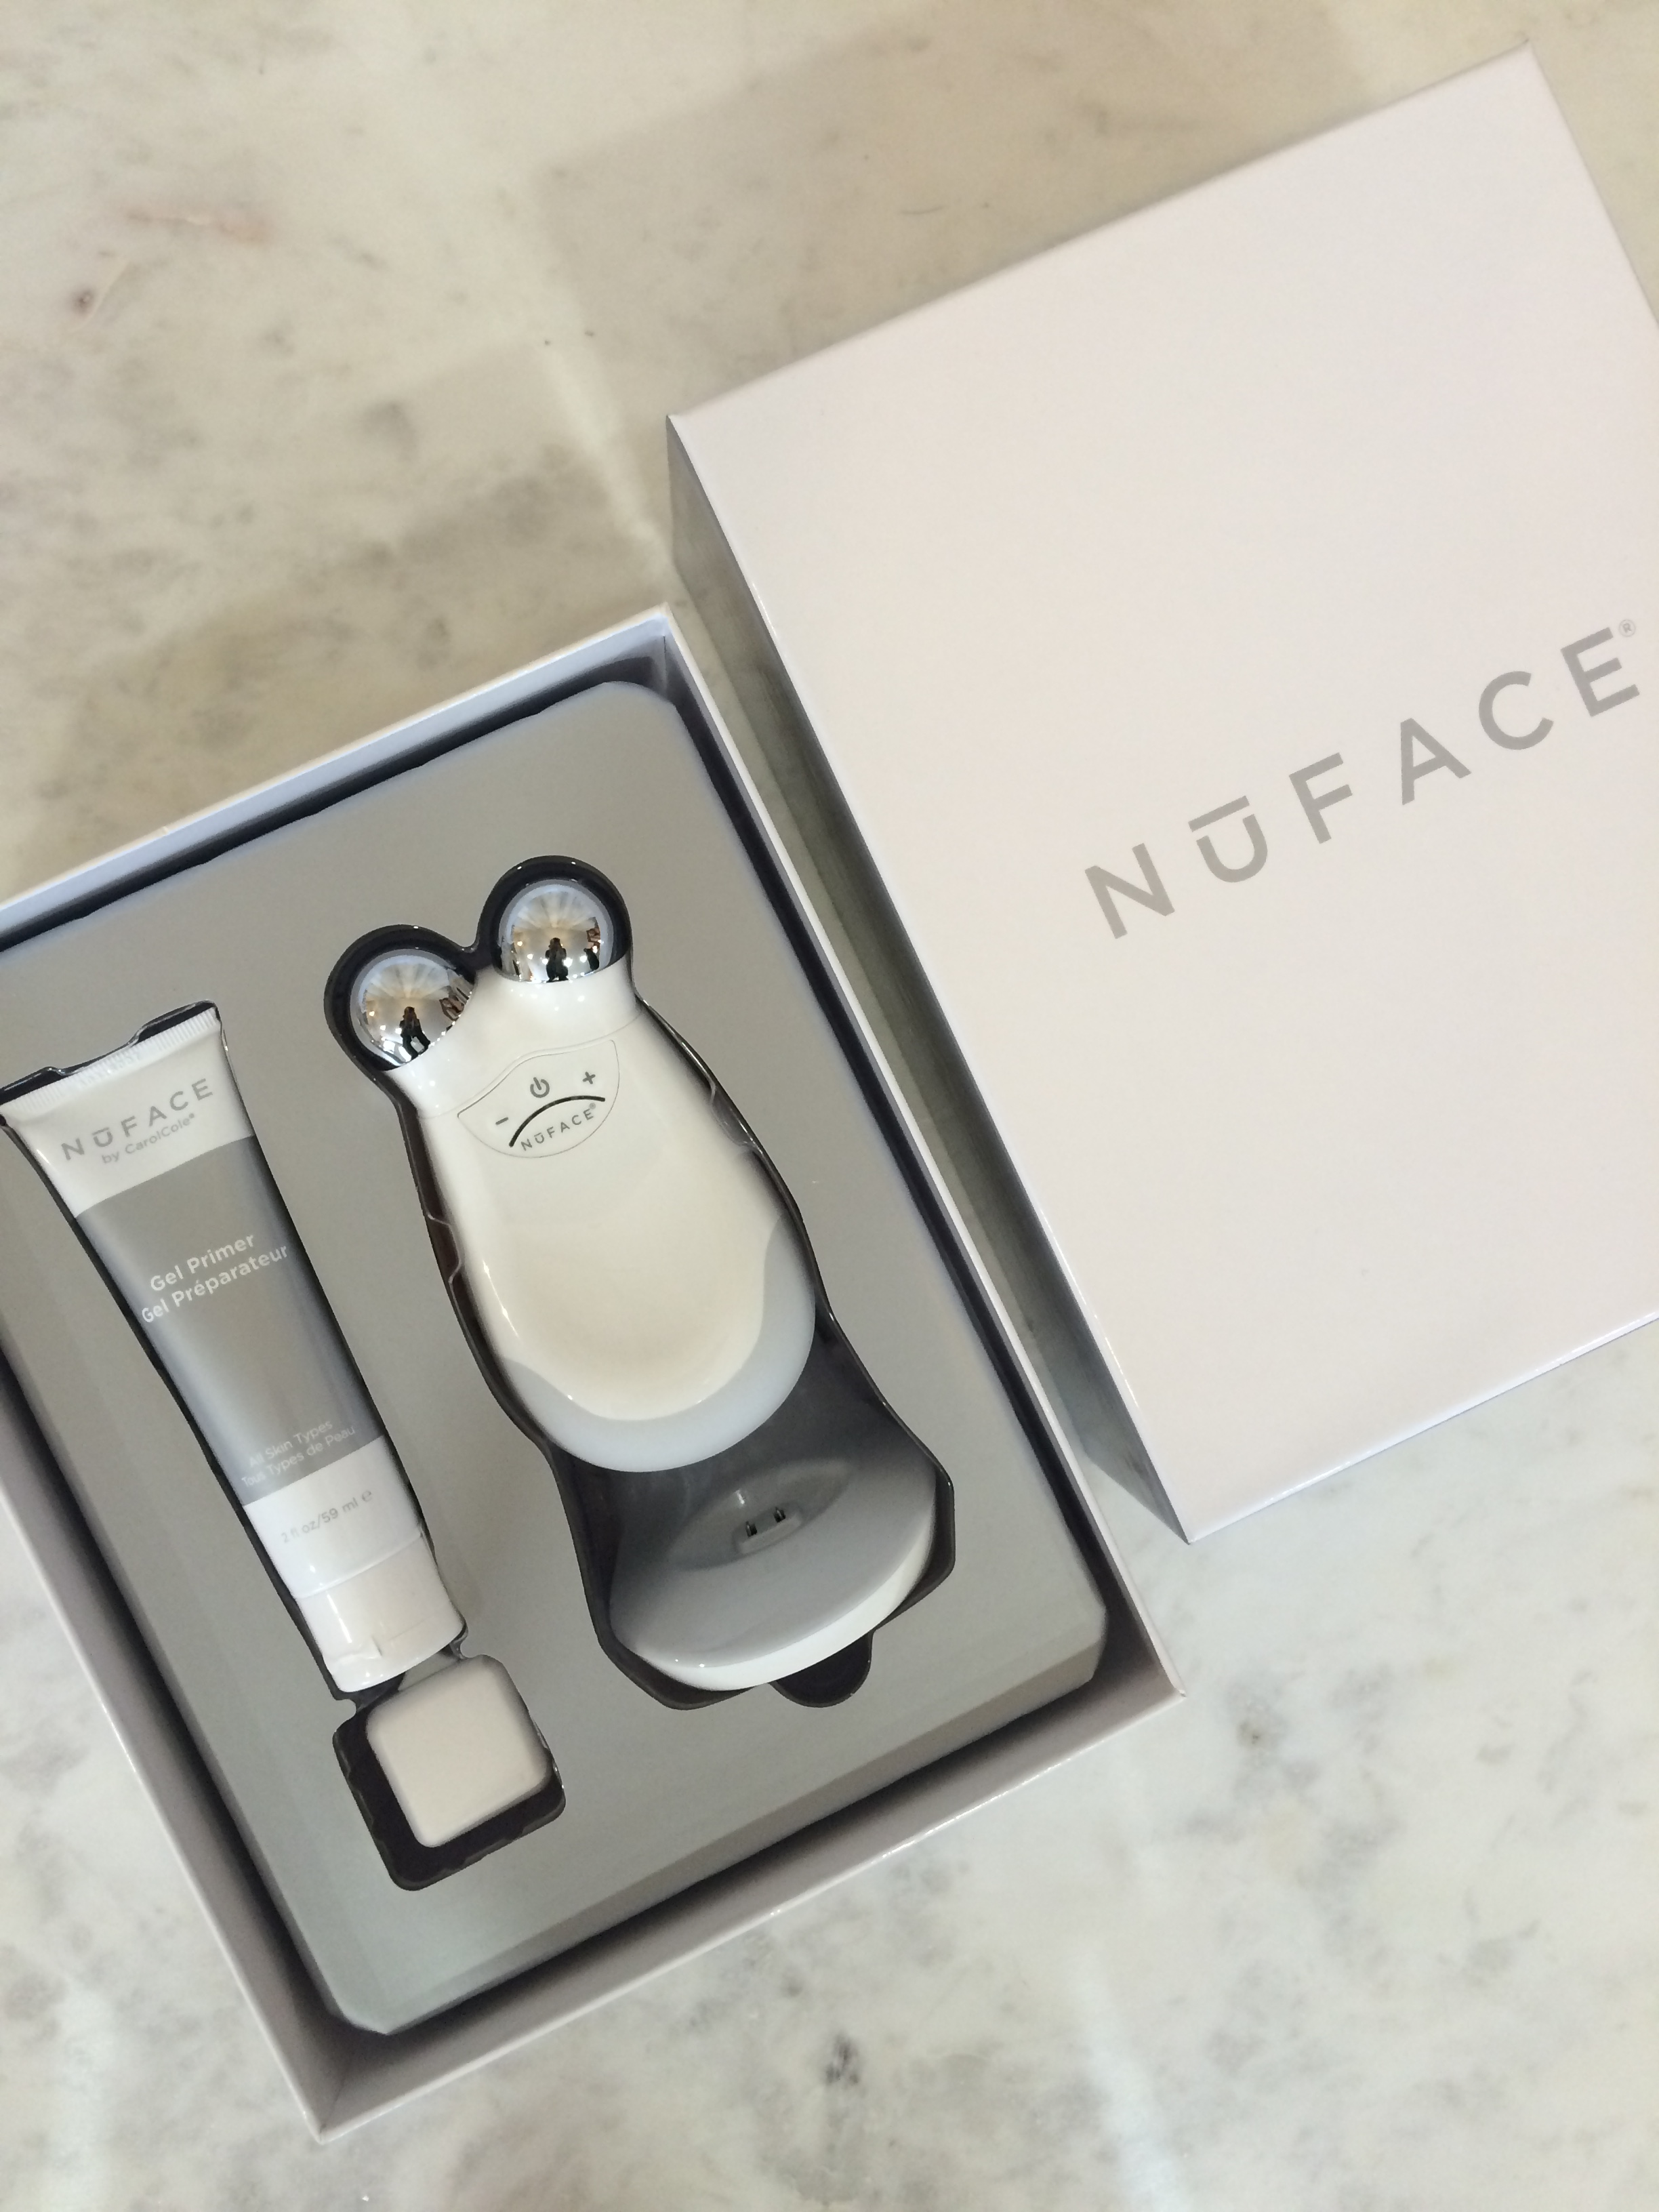 NUFACE device